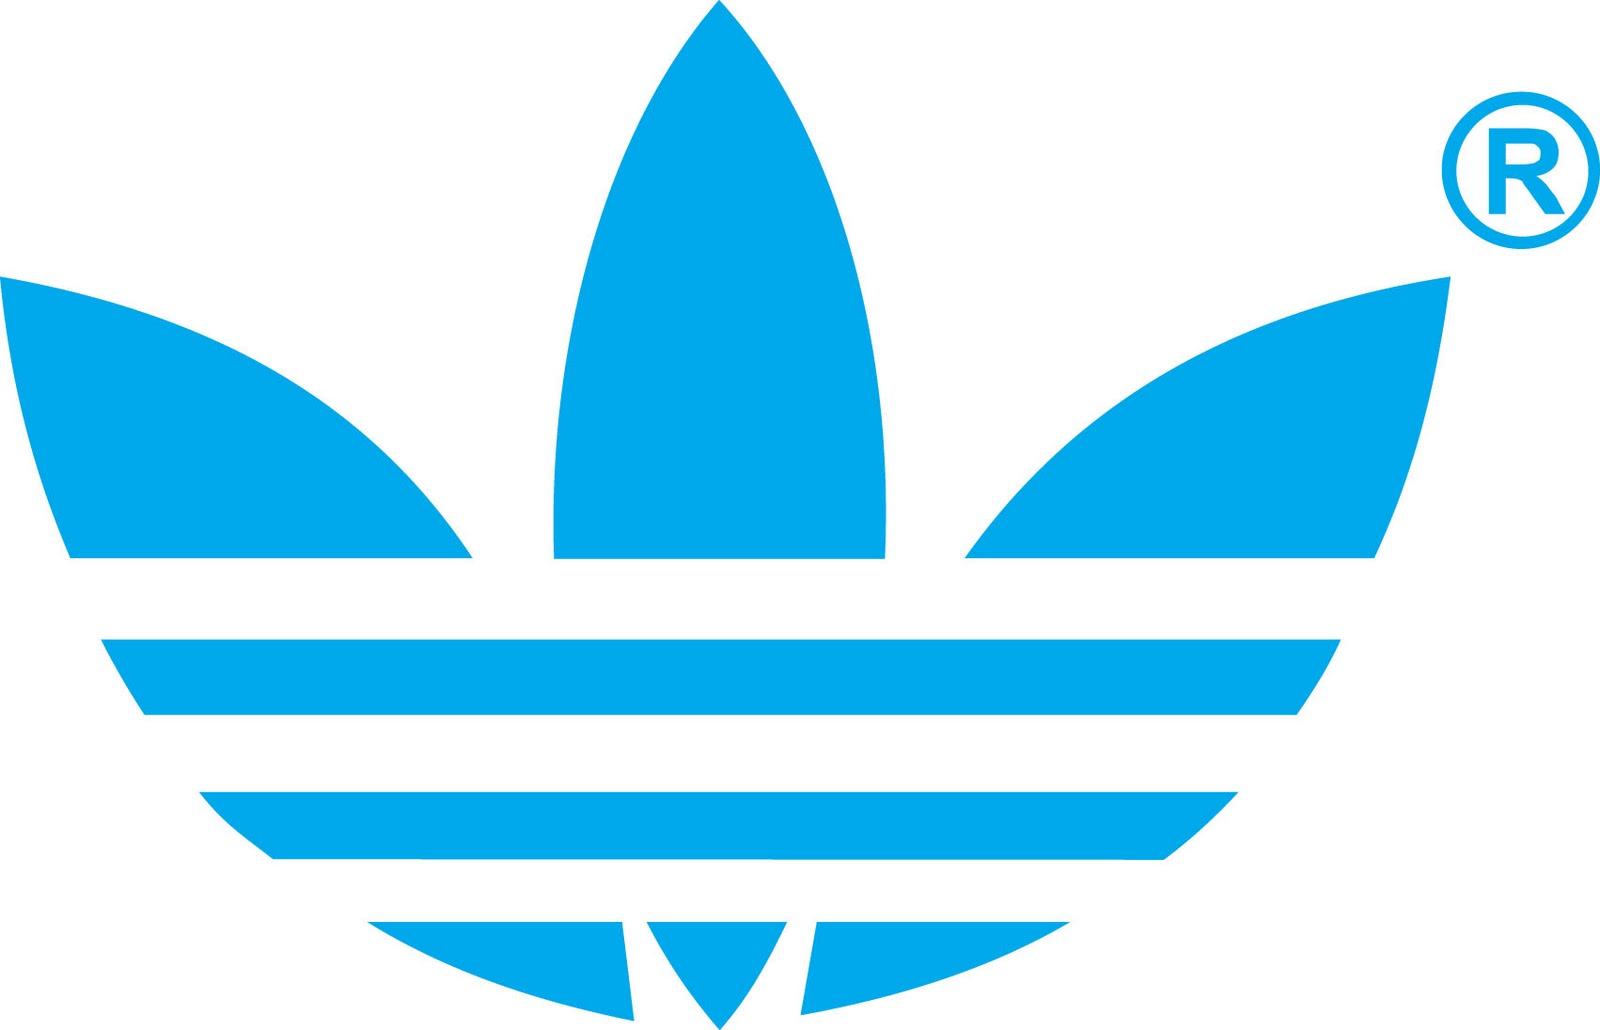 Adidas Logo Wallpaper 4174 Hd Wallpapers in Logos   Imagescicom 1600x1030